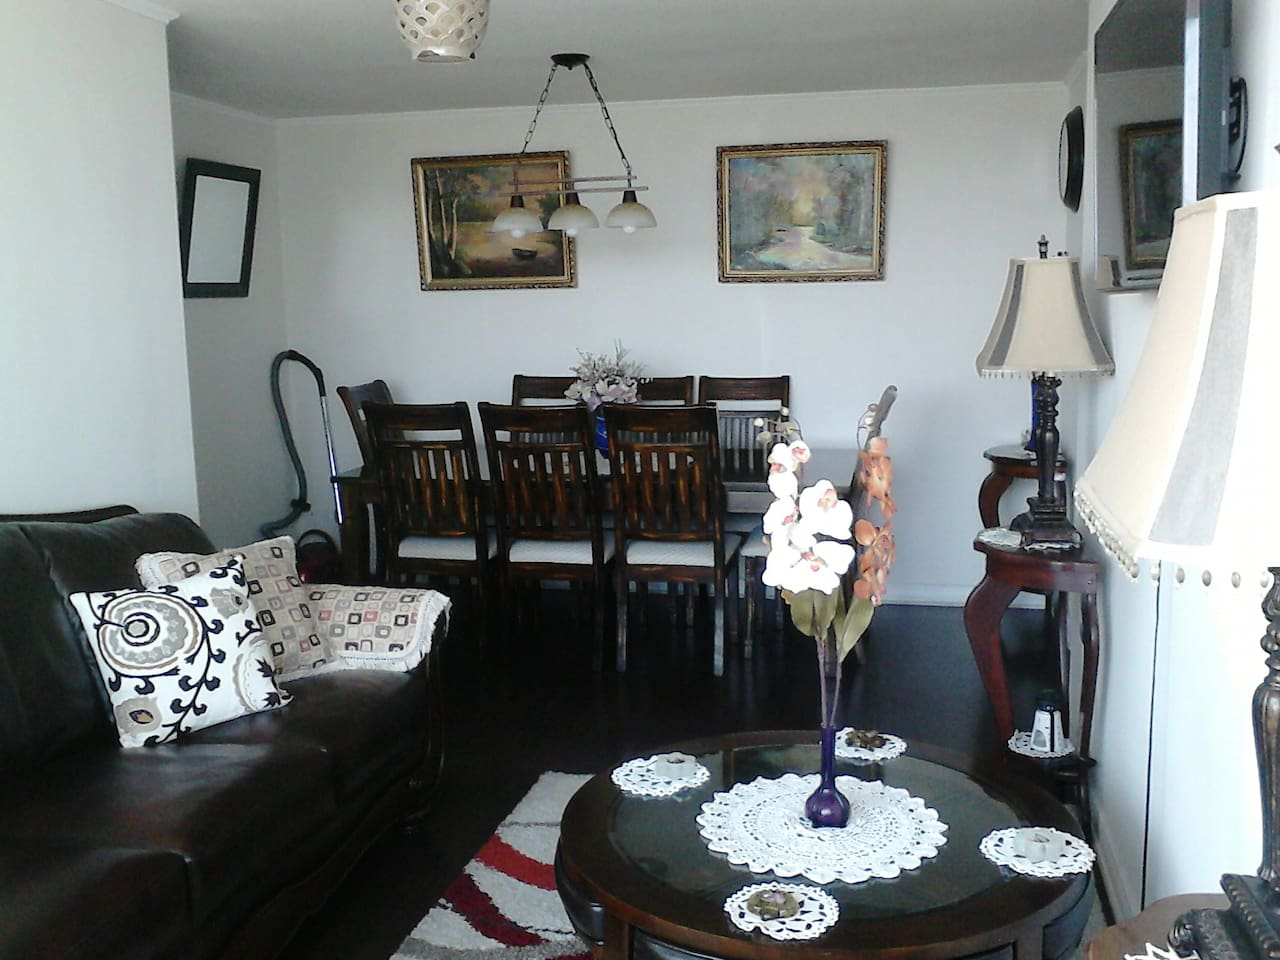 Livingroom - comedor - eating place